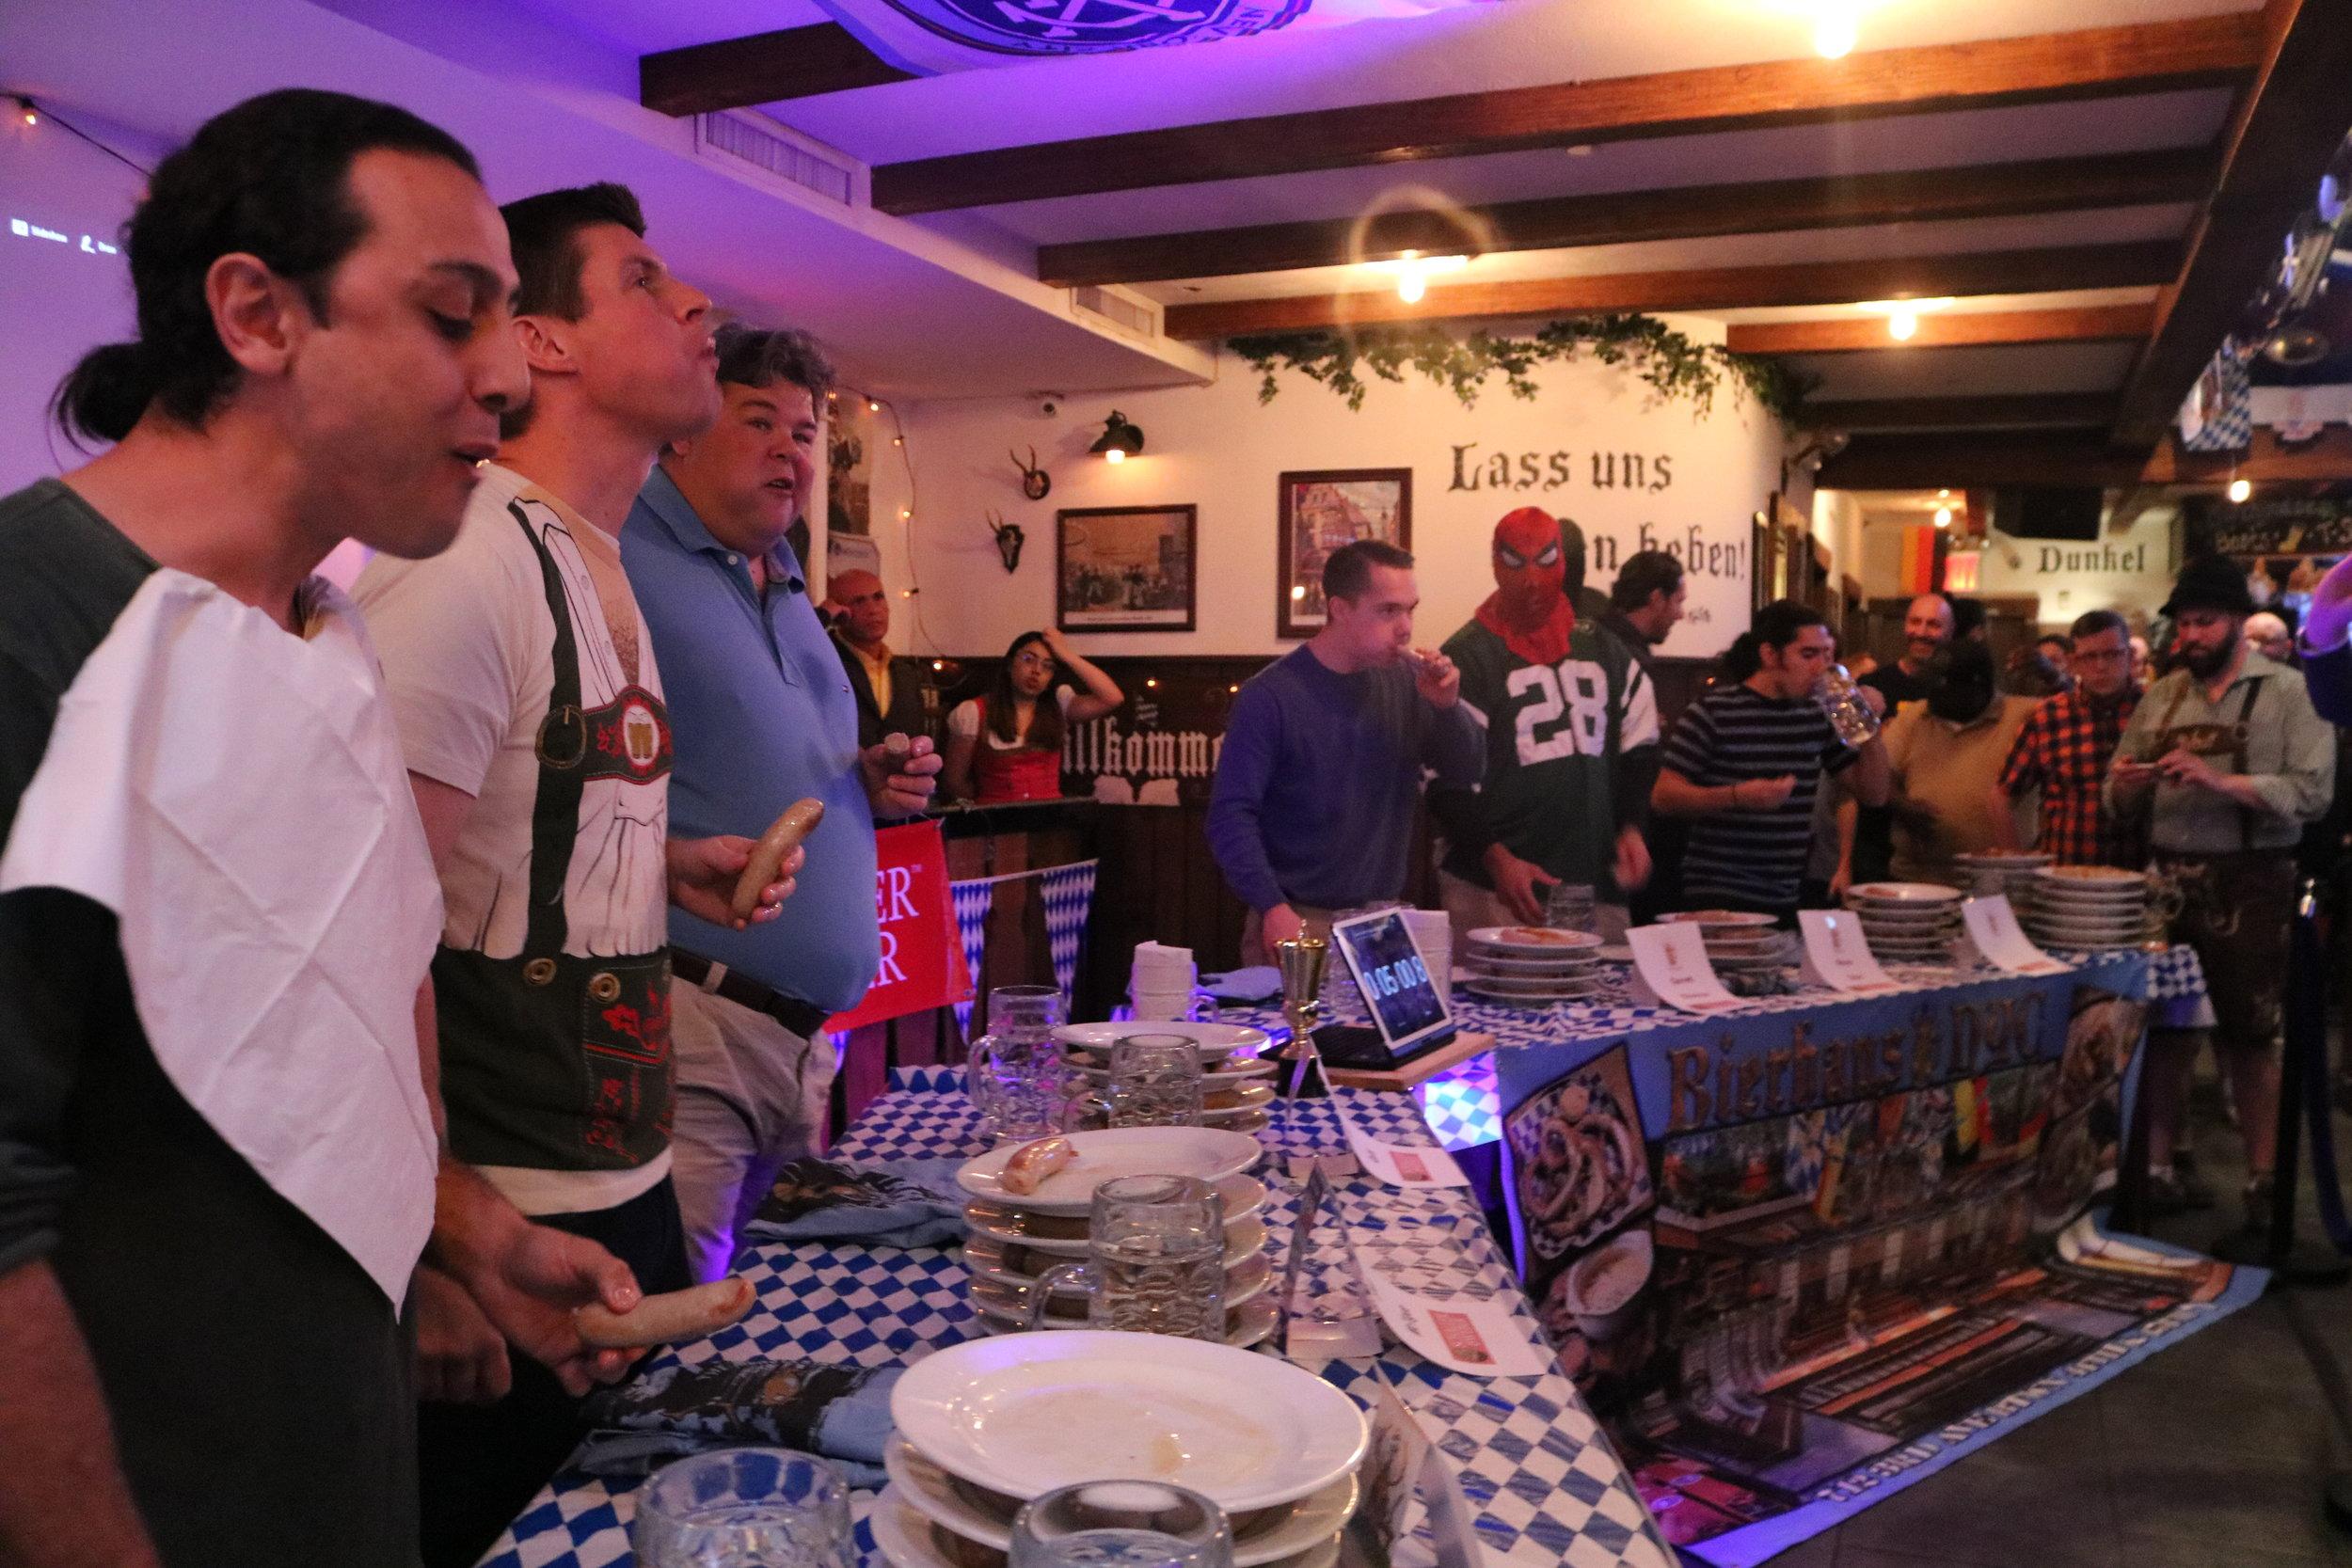 Bierhaus-NYC-Bratwurst-eating-championship.JPG